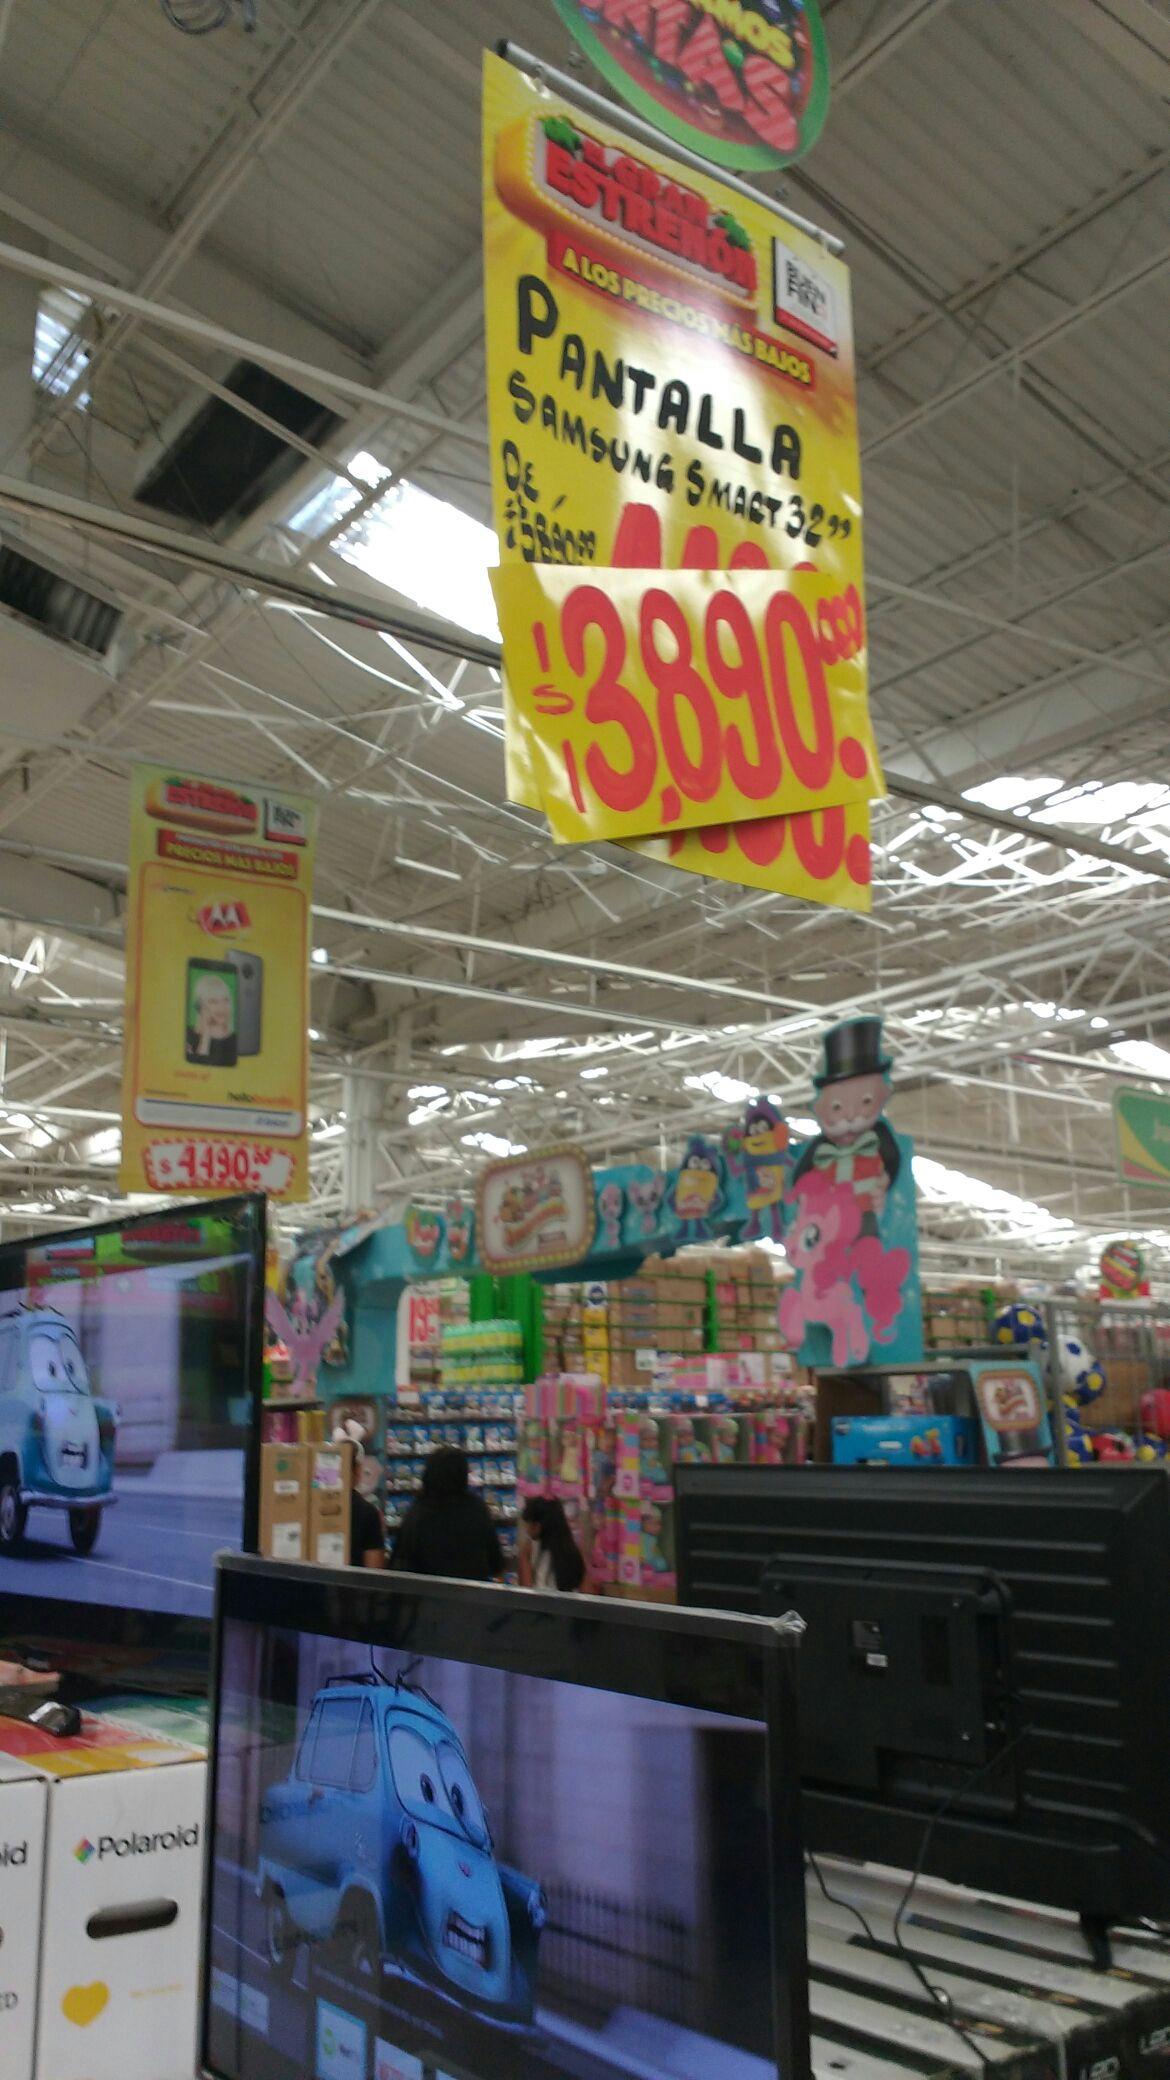 Pantalla Samsung 32 Smart TV bodega Aurrerá sucursal arboledas Guadalajara